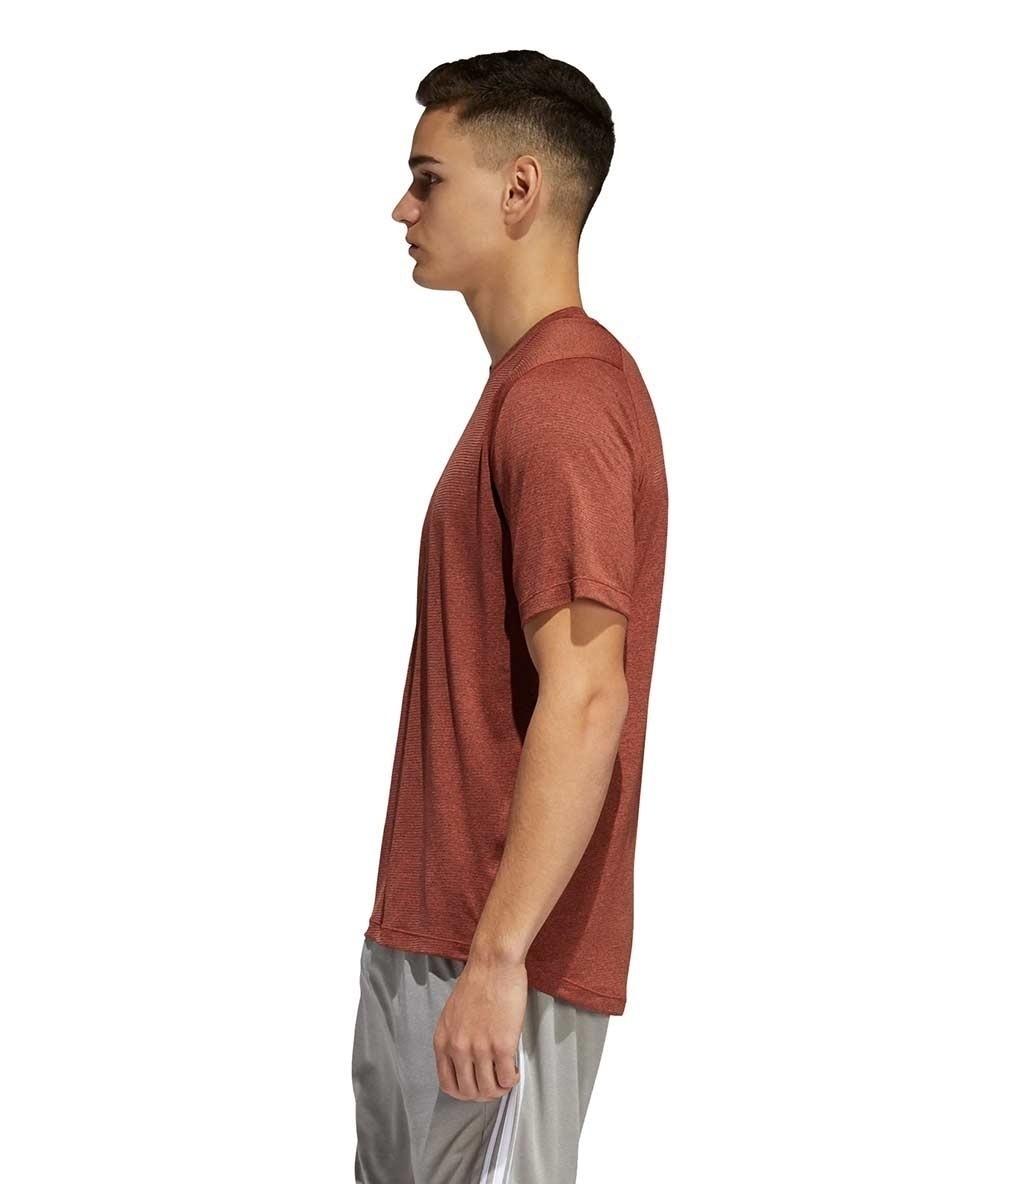 Adidas Freelift Tech Climacool T-Shirt Turuncu